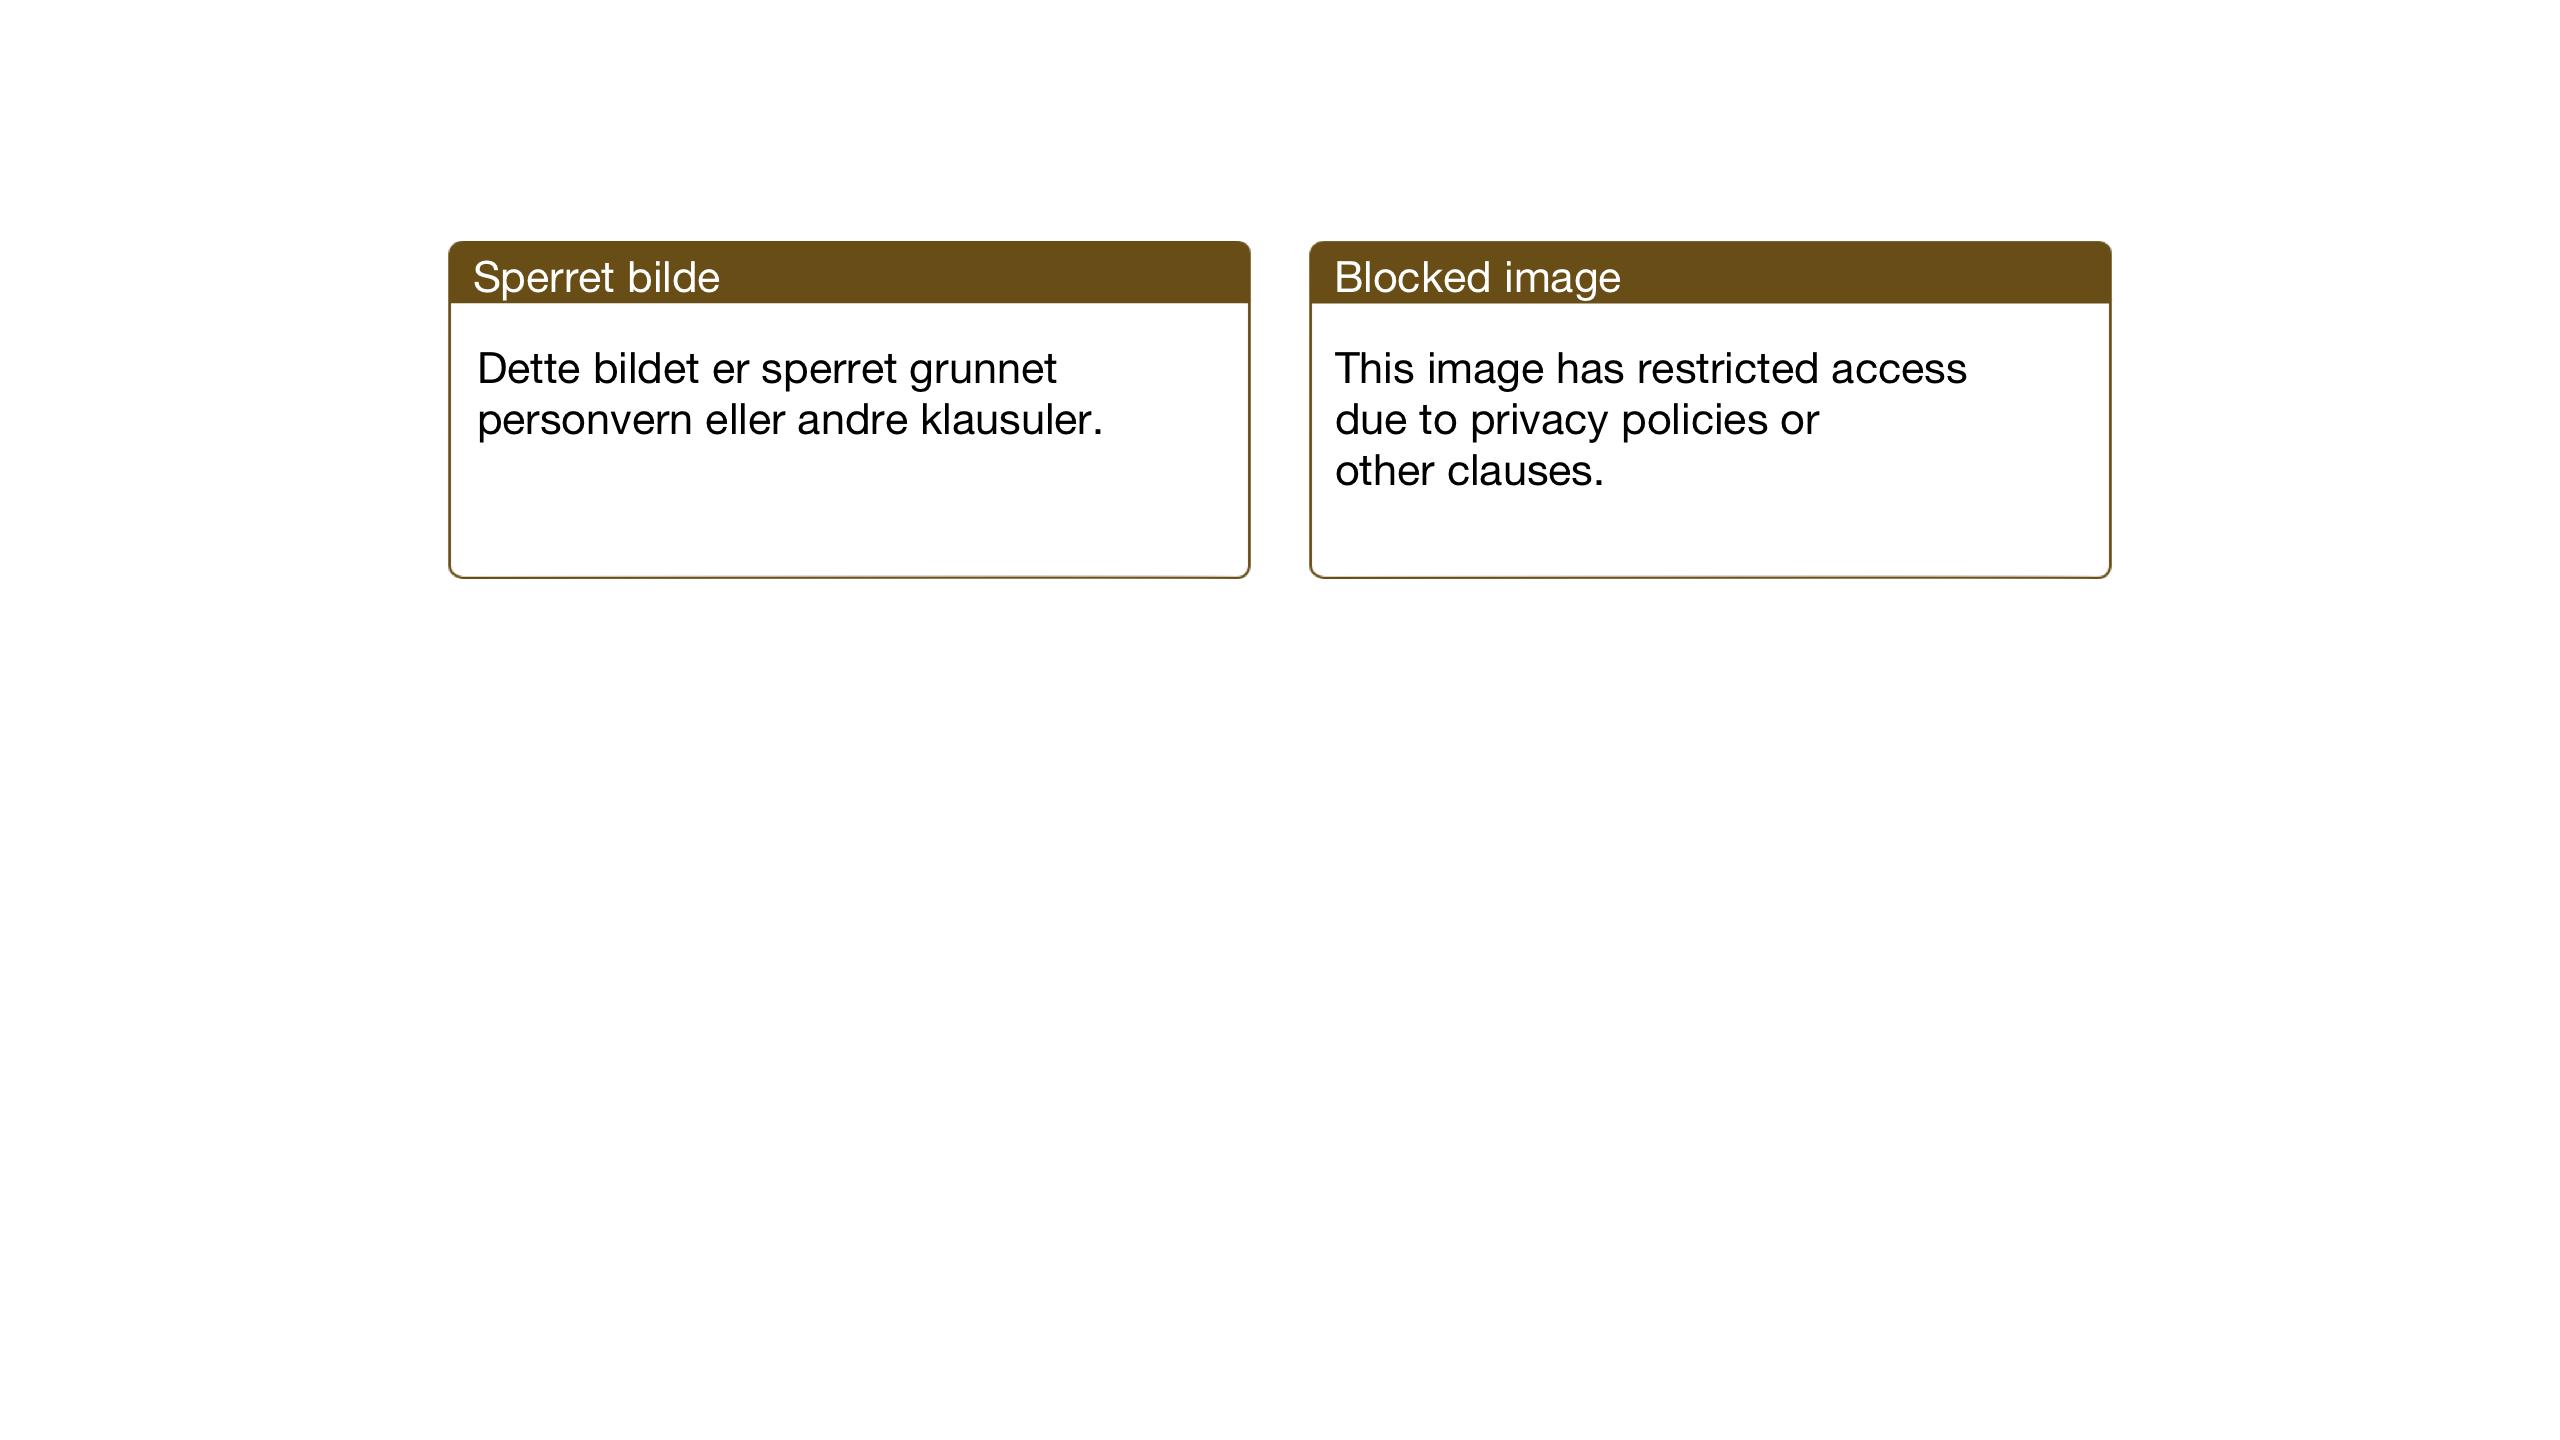 SAB, Domkirken Sokneprestembete, H/Haa: Ministerialbok nr. C 9, 1958-2001, s. 198b-199a